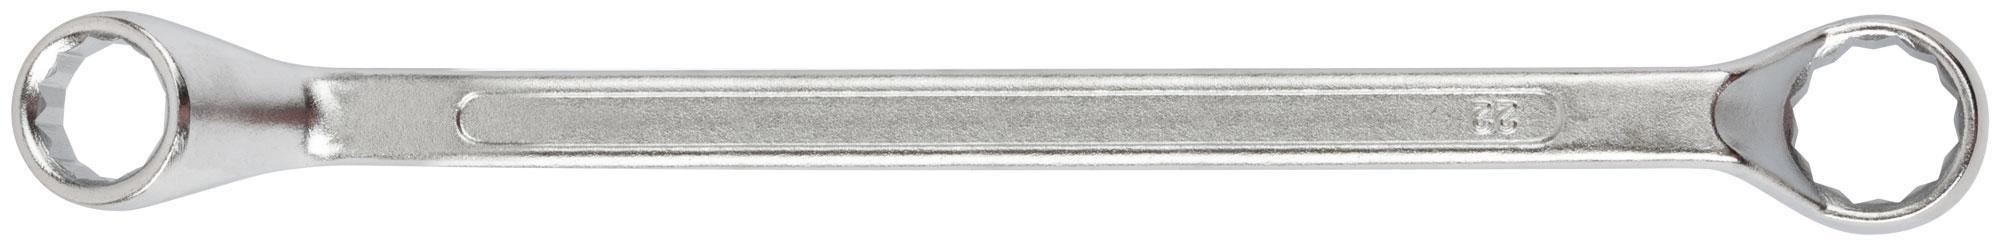 Ключ гаечный накидной 19х22 Fit 63539 (19 / 22 мм)